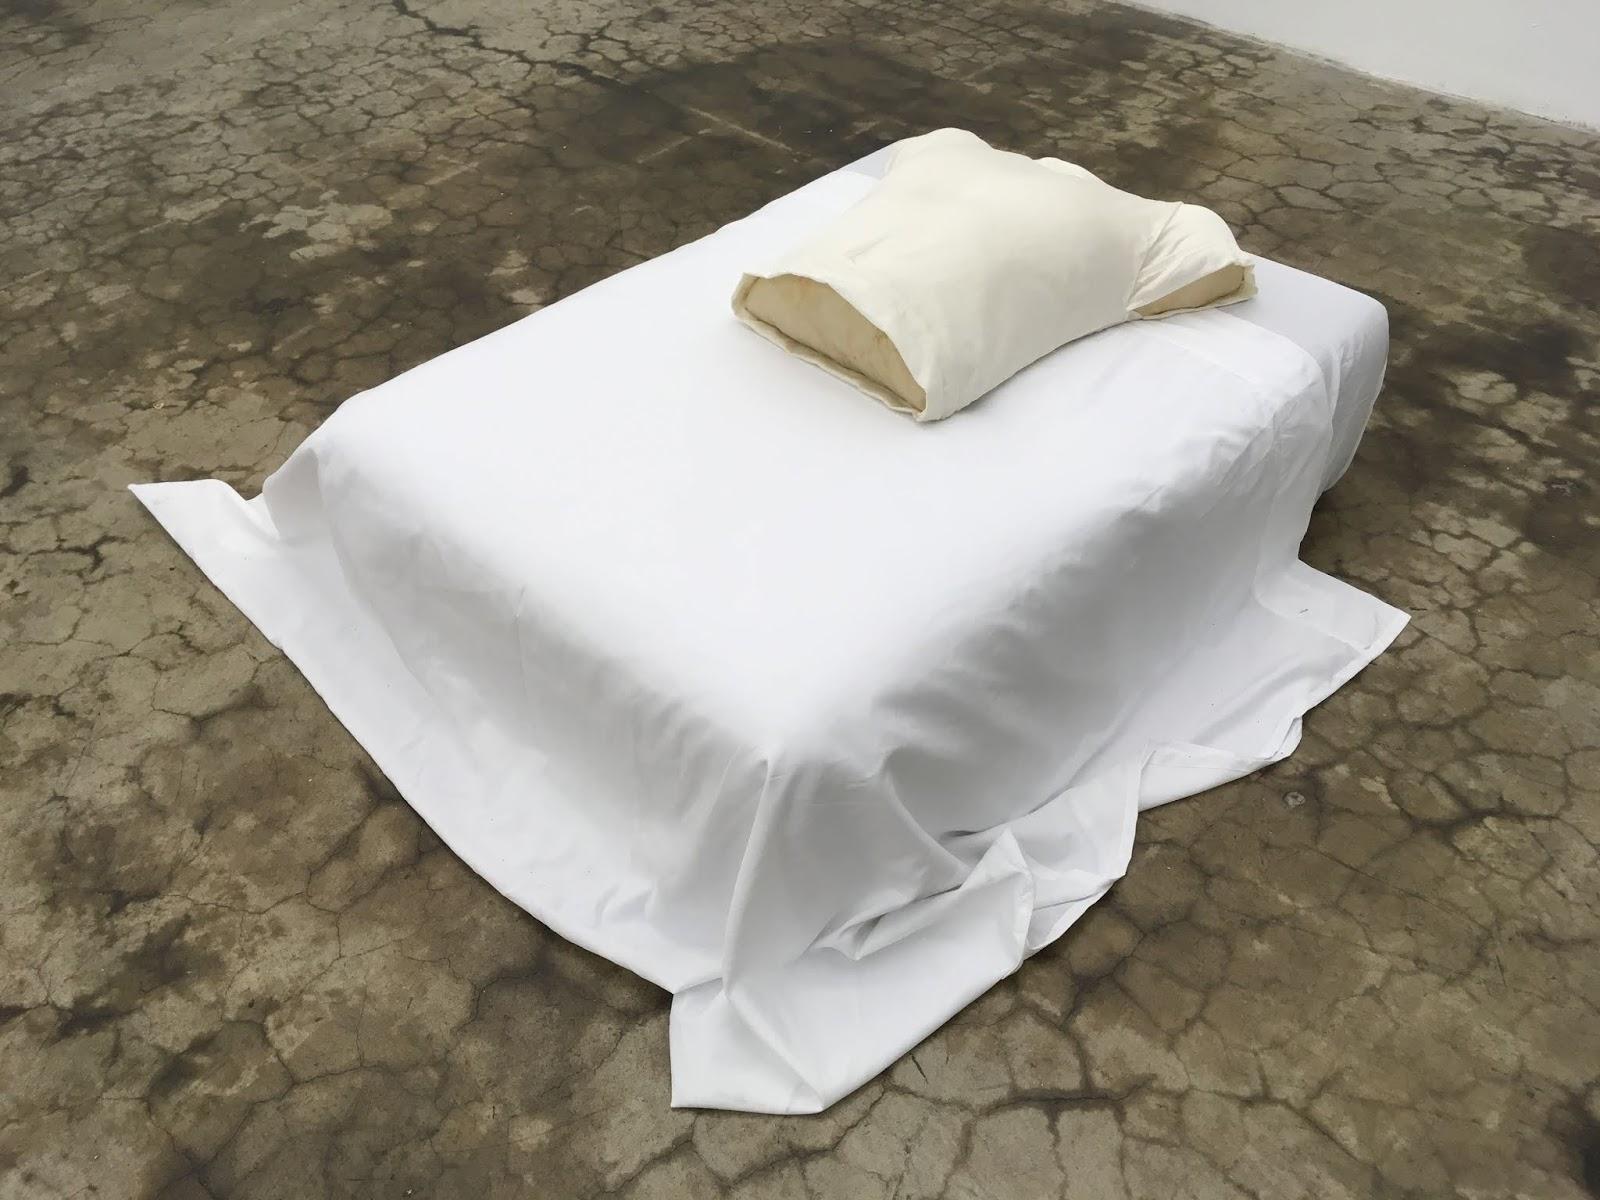 Pillow Talk  Pillowcase, expanding foam and bedsheets on foam 18 x 30 x 41 in. 2018